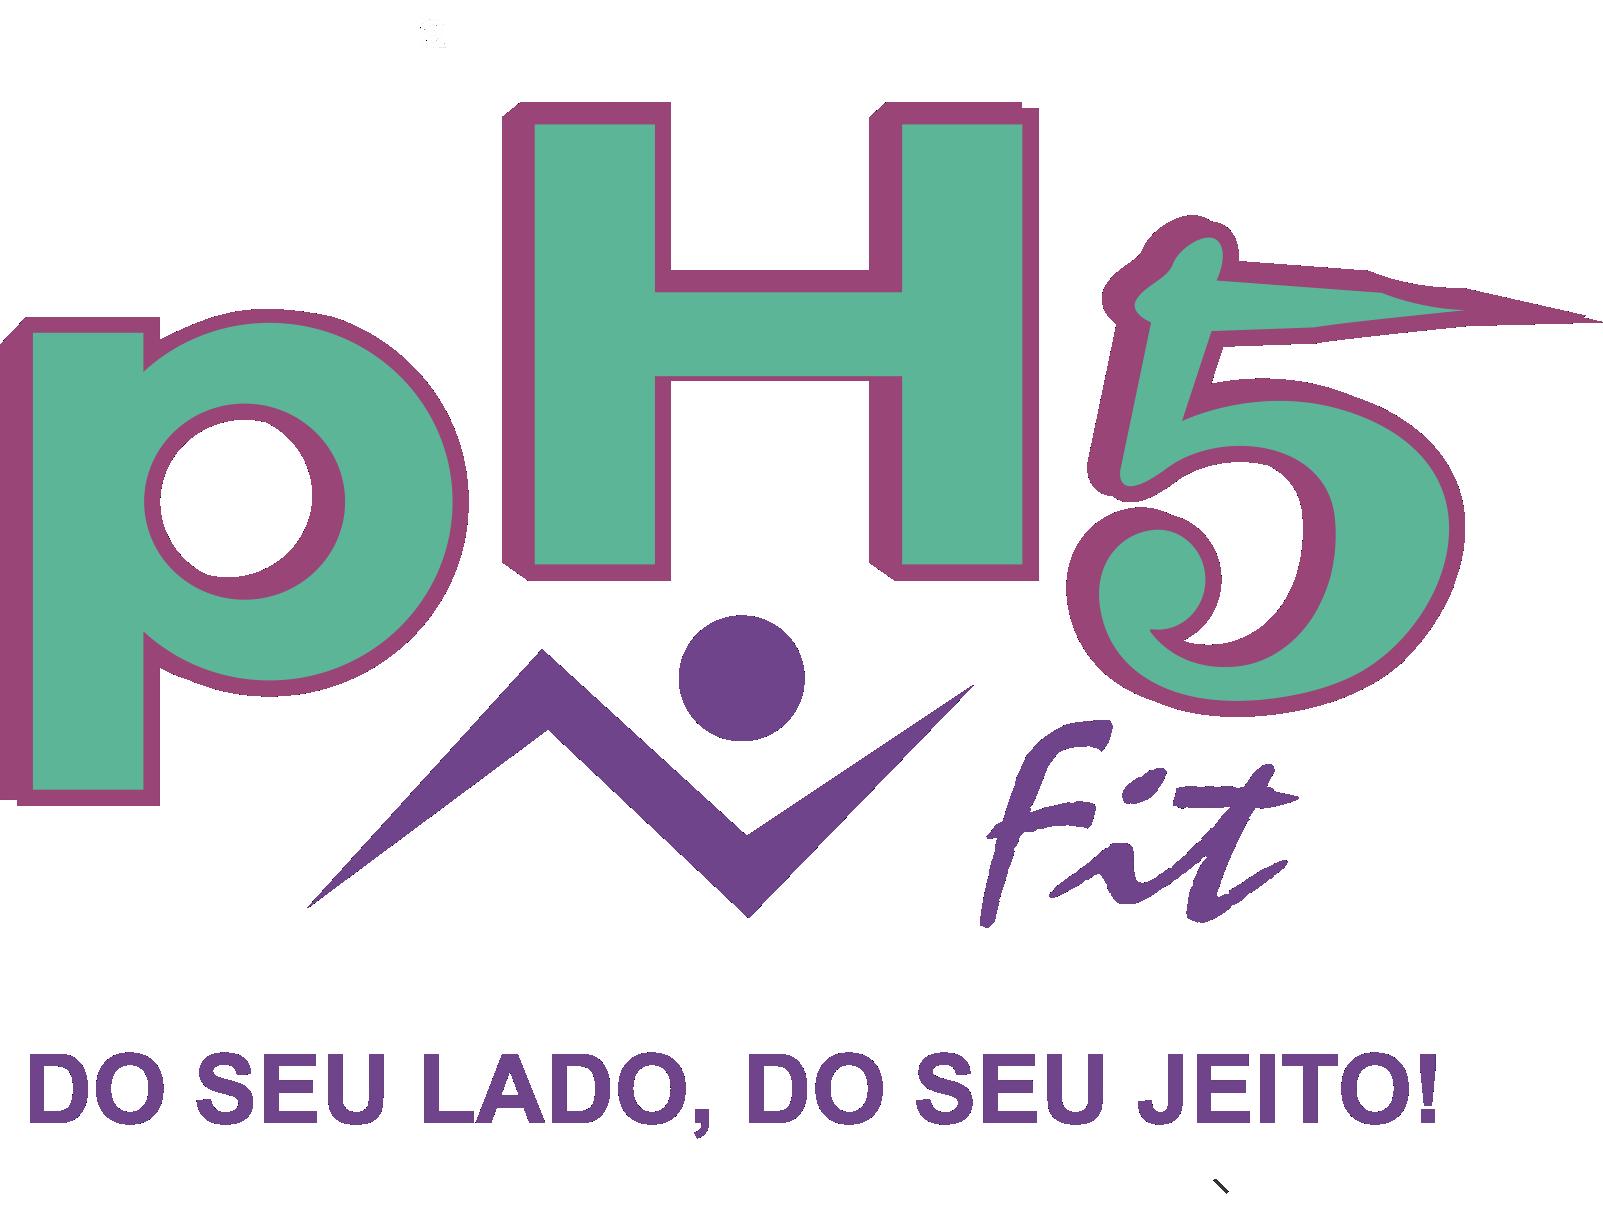 Ph5fit